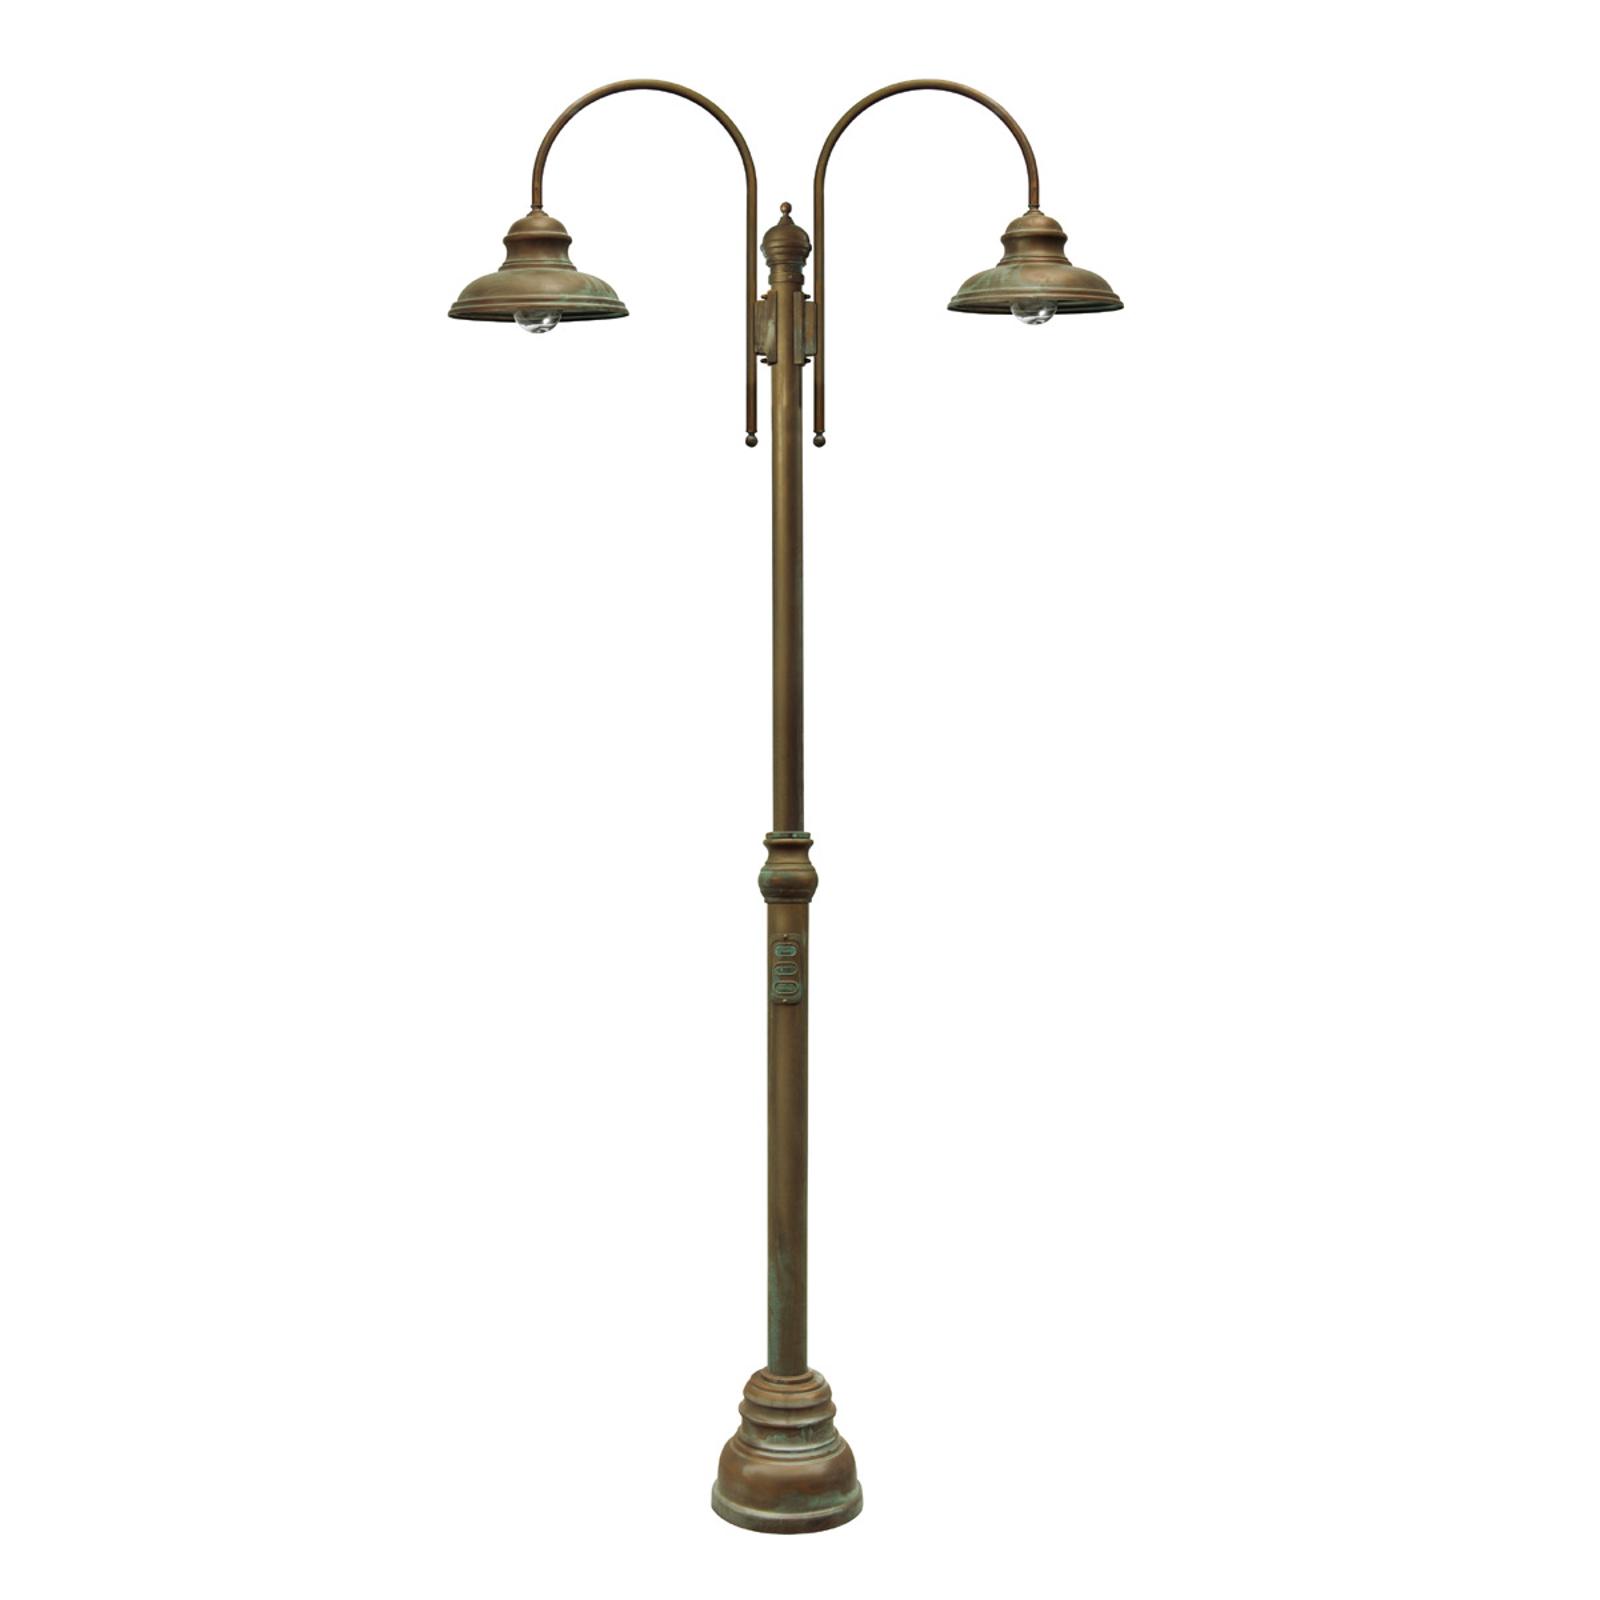 Luca post light brass antique copper, two-bulb_6515188_1